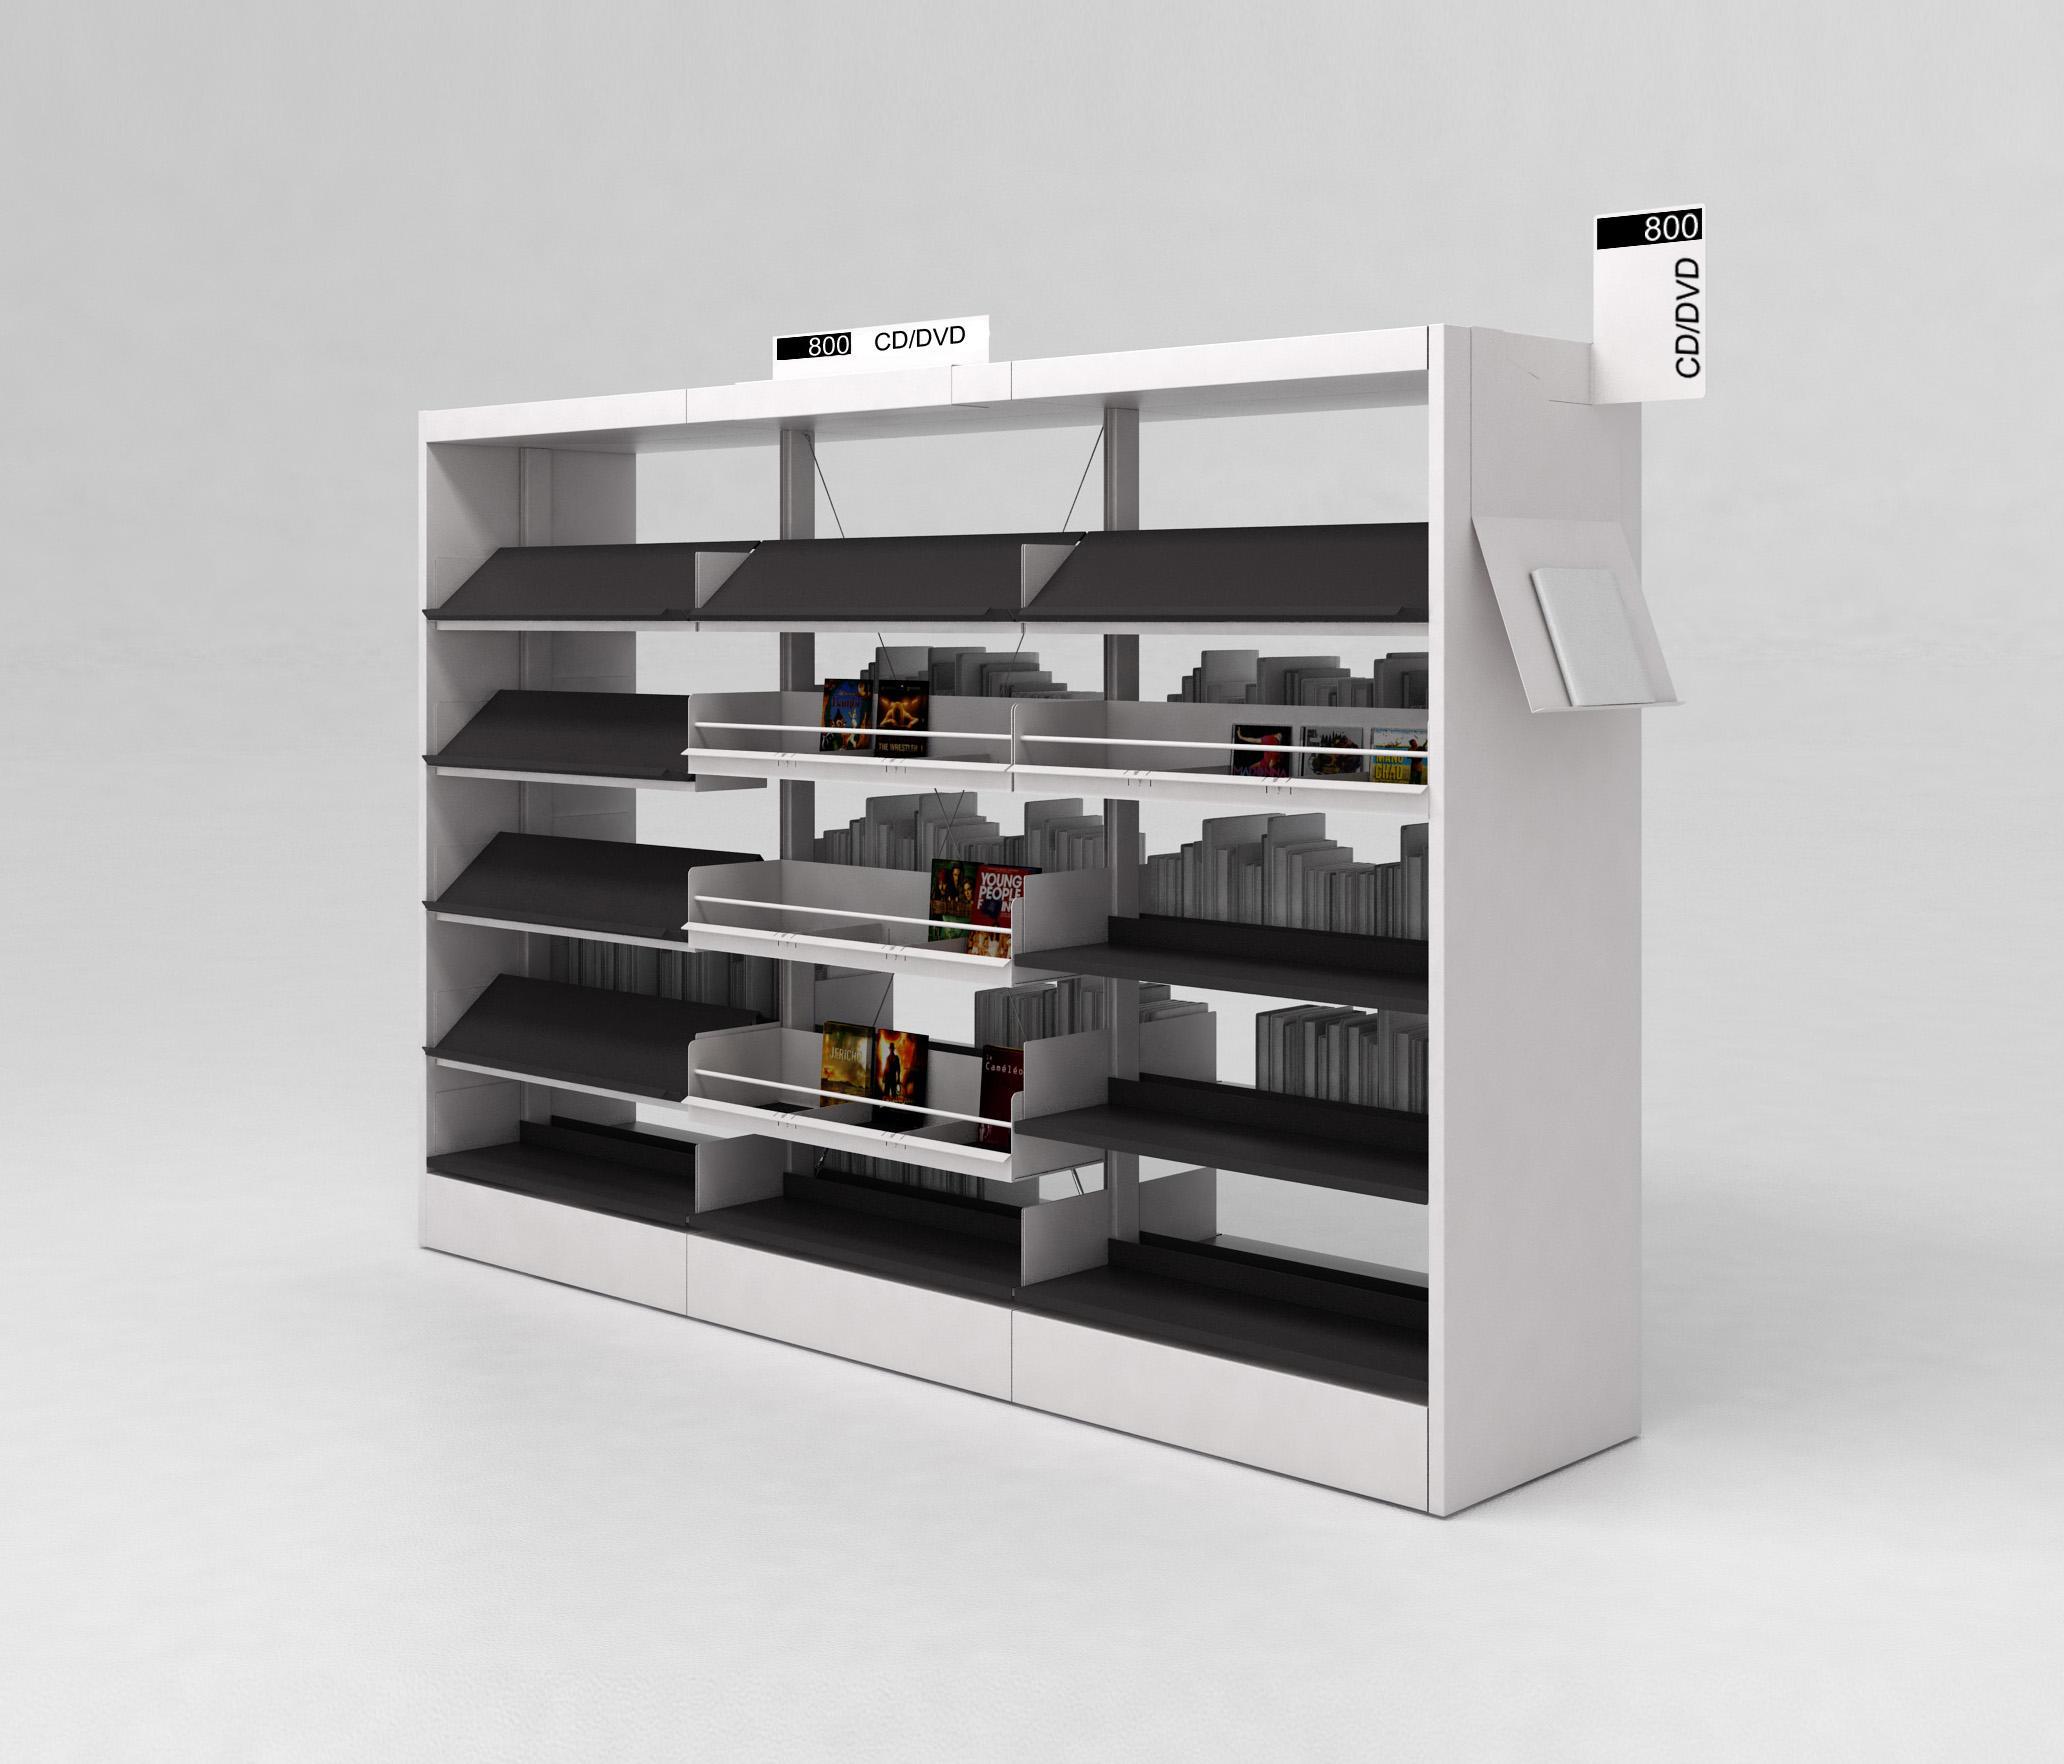 bk 3 bilbliotheksregale von idm coupechoux architonic. Black Bedroom Furniture Sets. Home Design Ideas